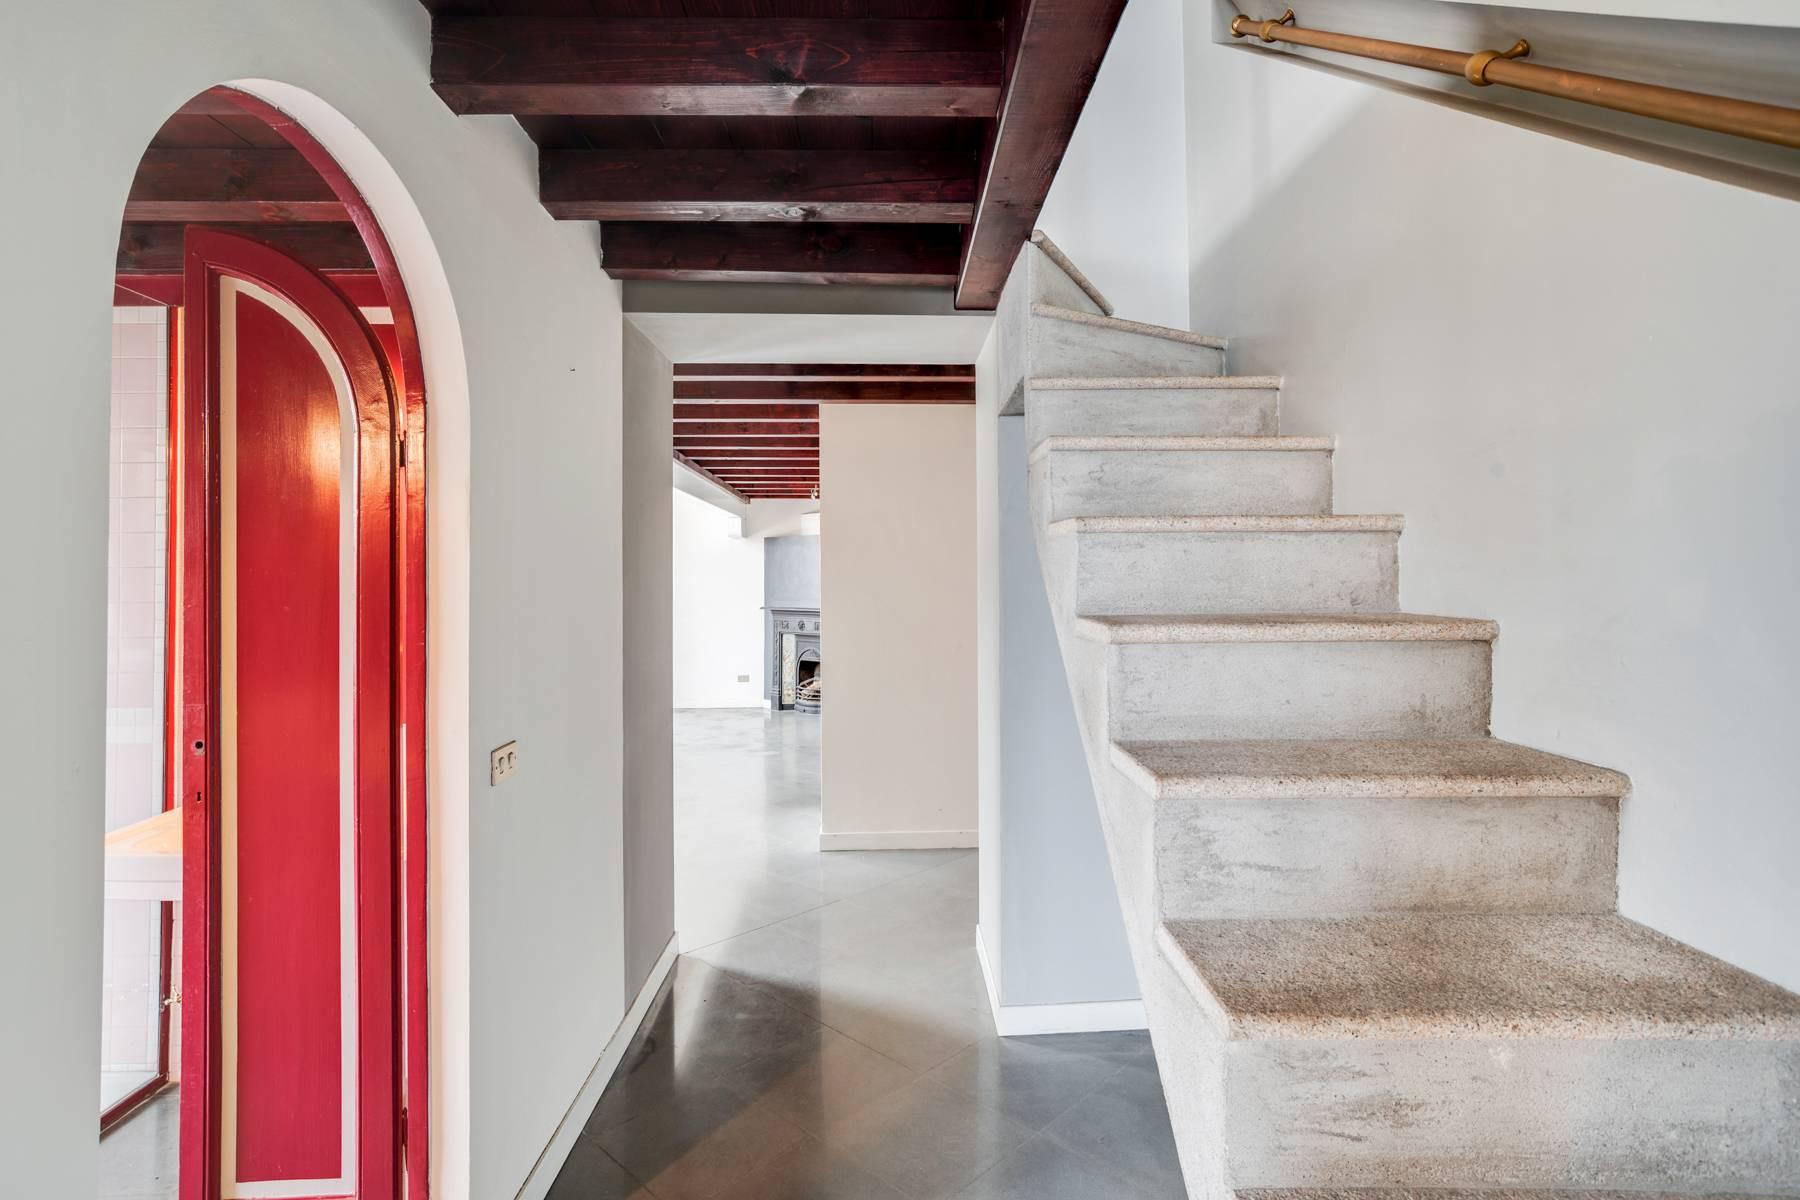 Appartamento in Vendita a Belgirate: 4 locali, 118 mq - Foto 19